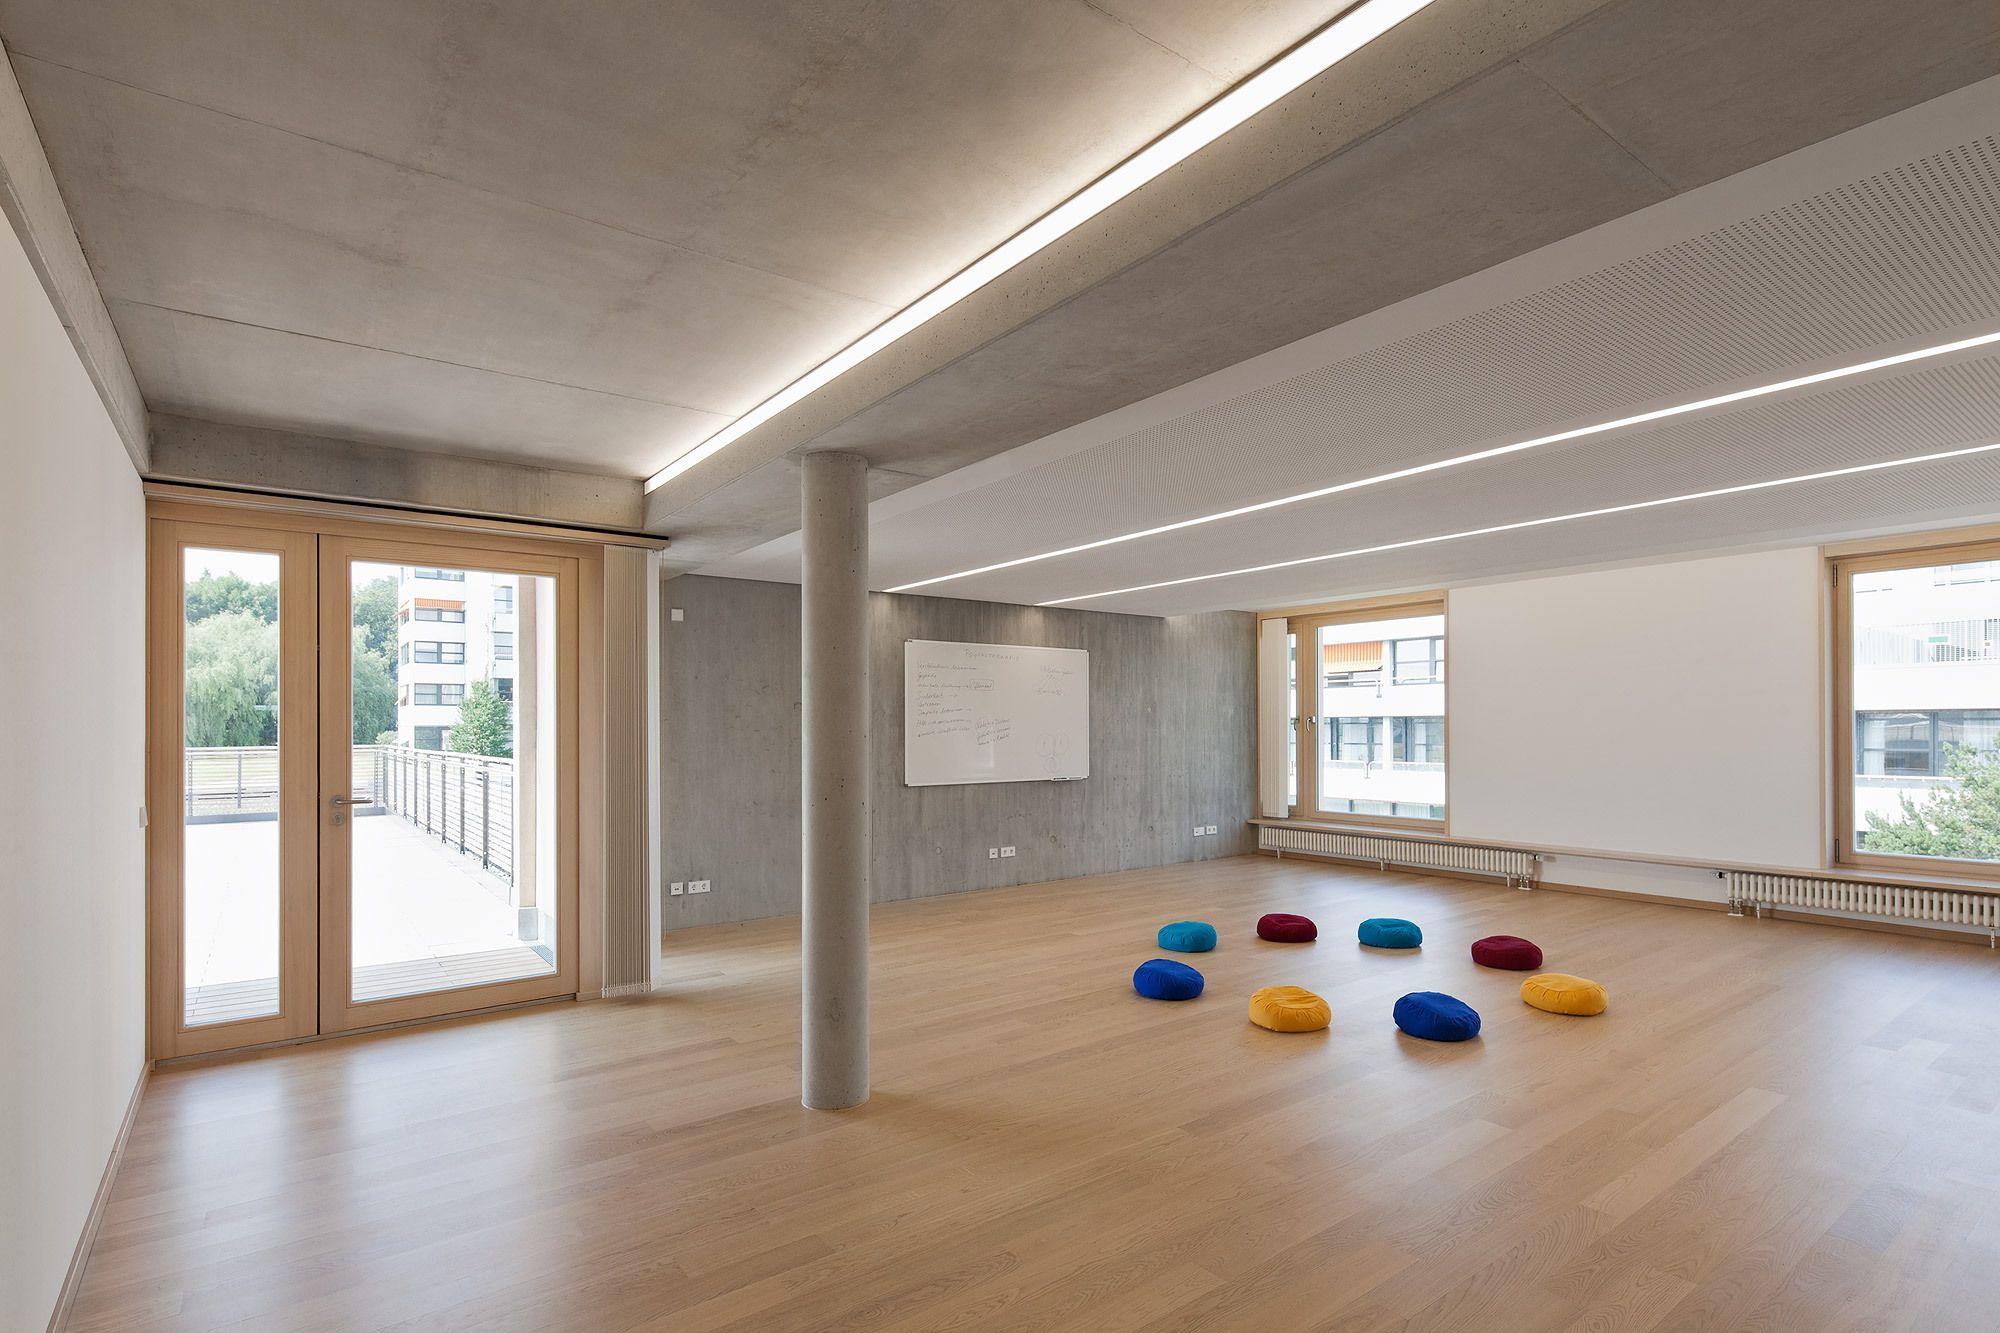 Psychiatric Centre Friedrichshafen - Projects To Try - Pinterest -